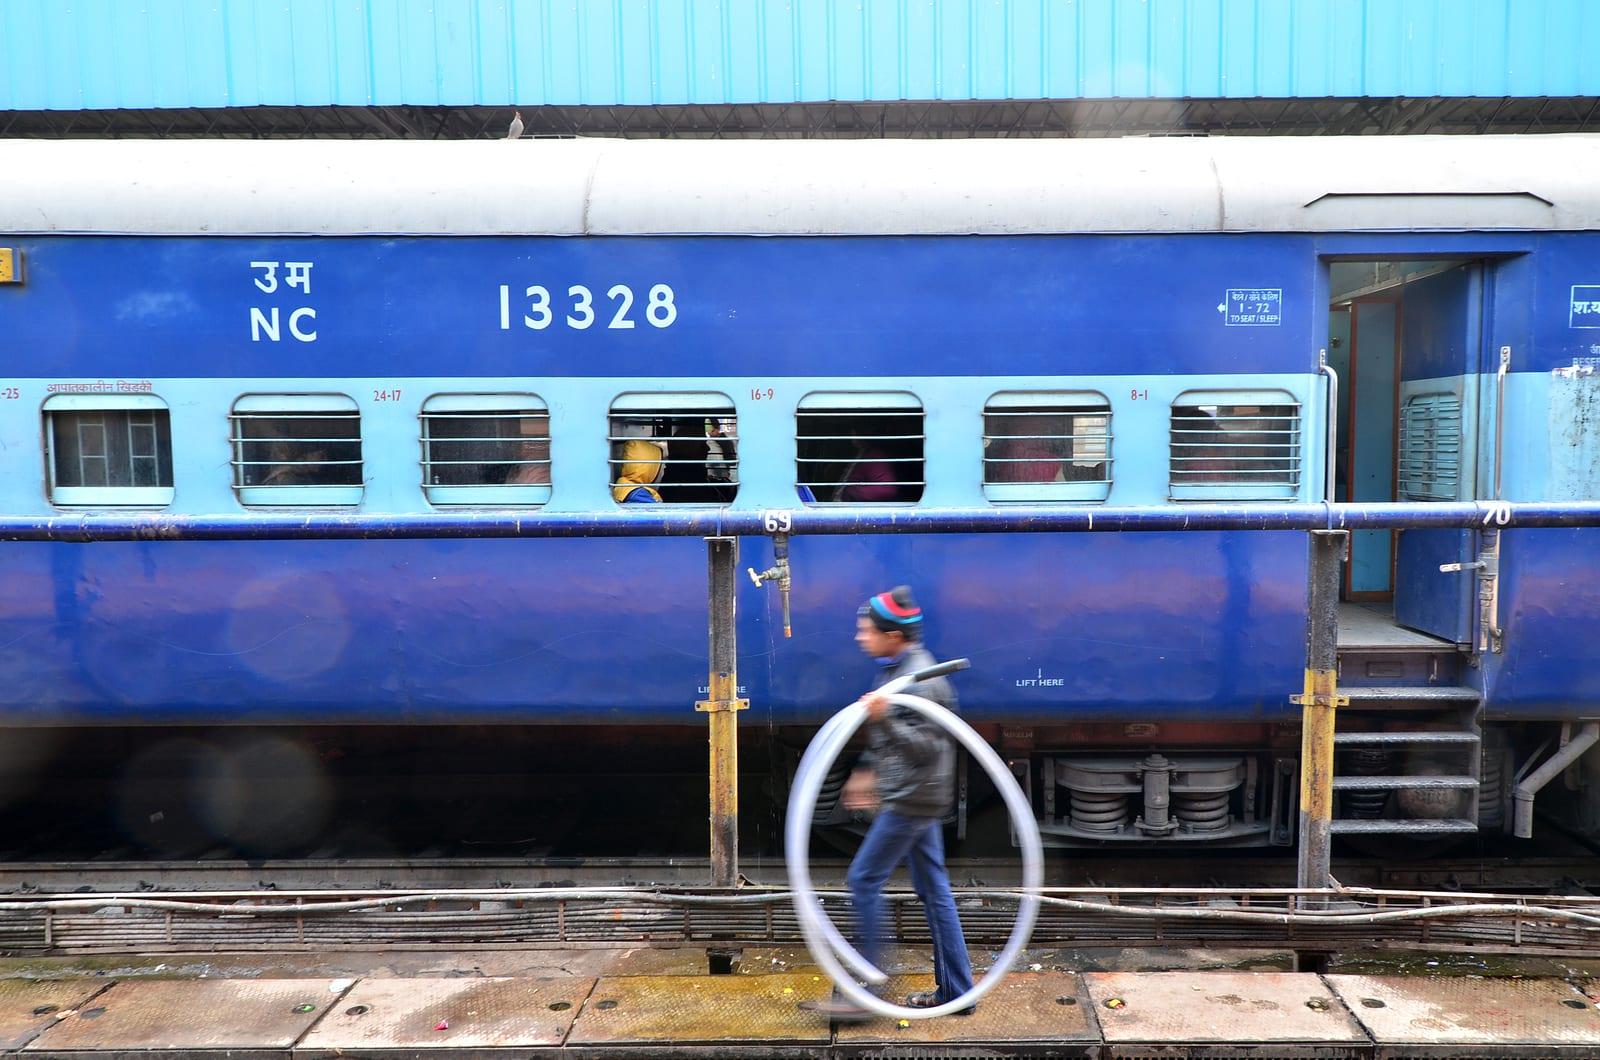 Indian Railways next big station - Big Data Junction!